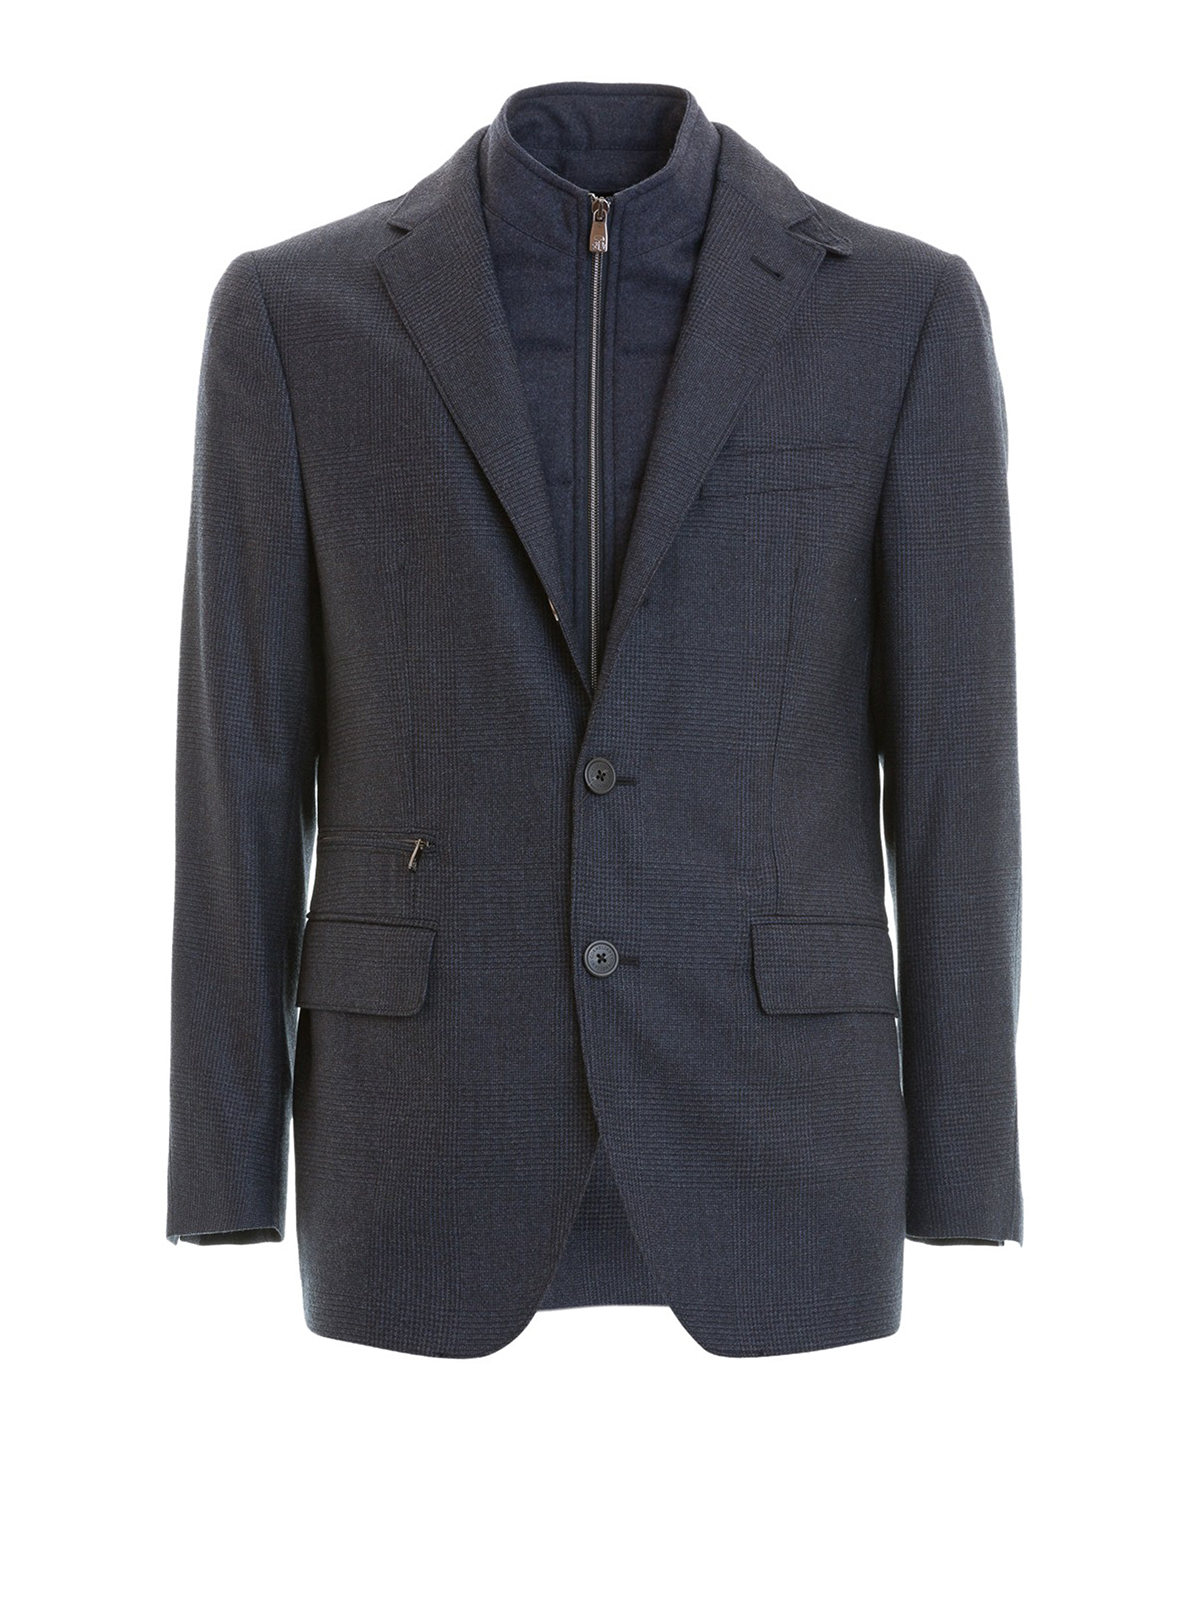 Corneliani - Blazer in lana blu imbottito - giacche blazer ... 2c99222d0cb